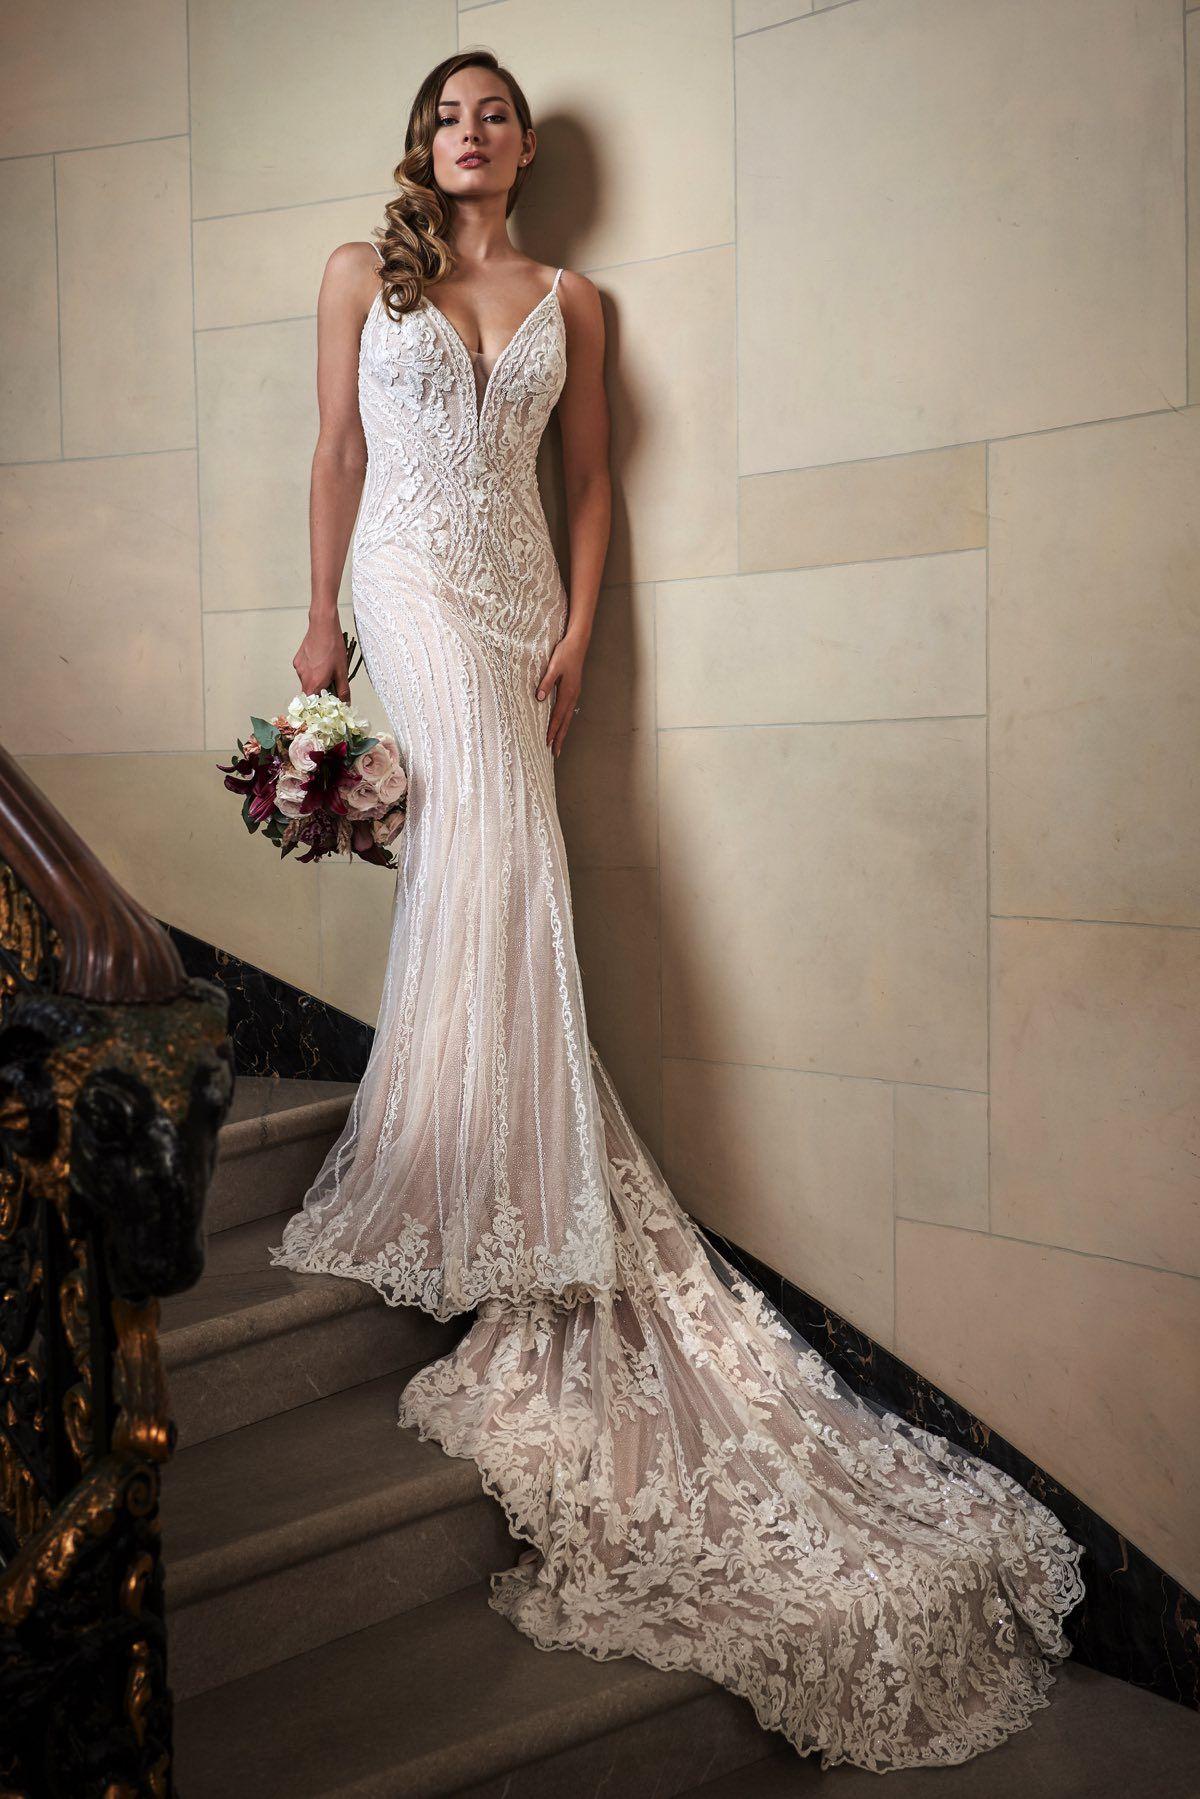 Jasmine T222005 Form Fitting Wedding Dress Wedding Dress Inspiration Alternative Wedding Dresses [ 1799 x 1200 Pixel ]